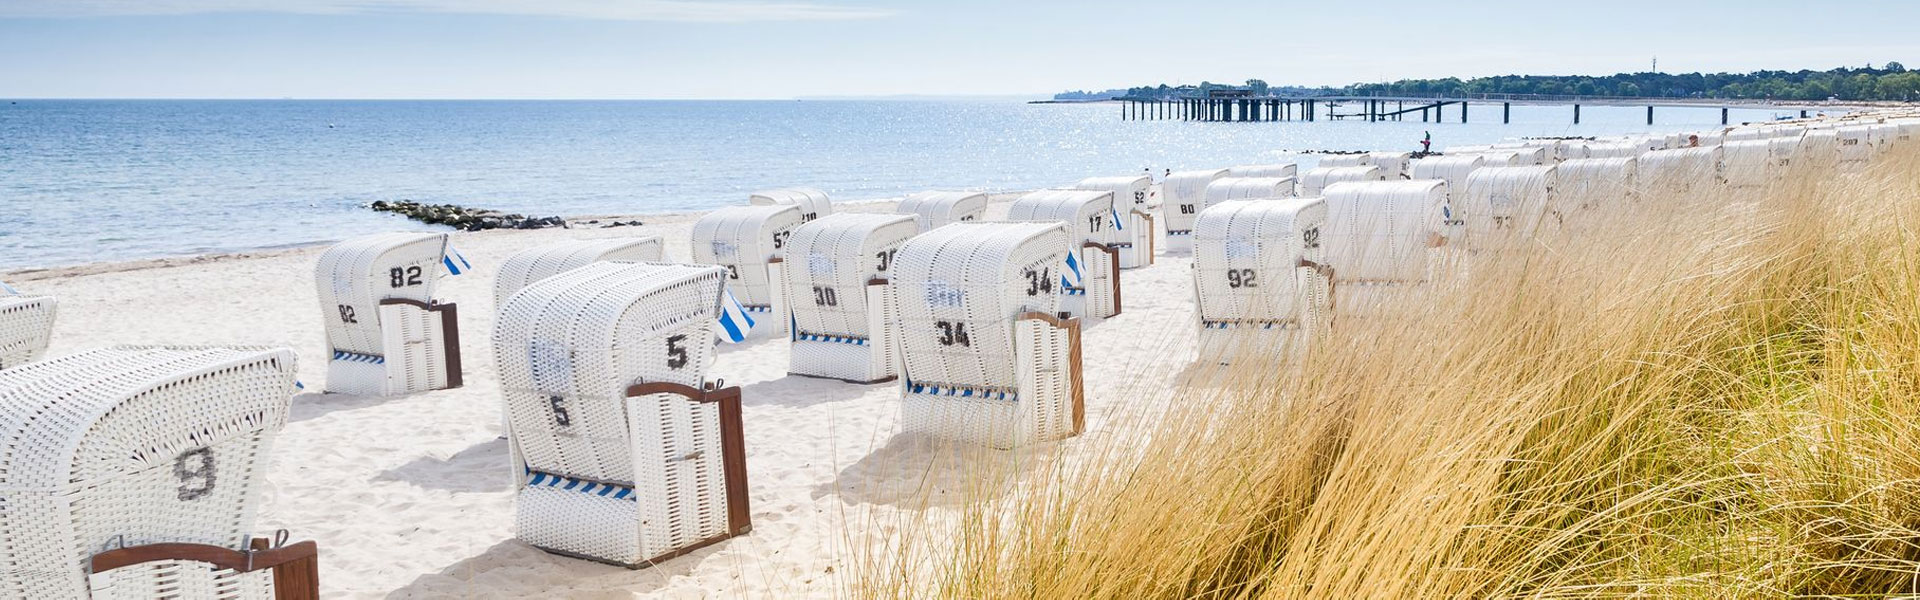 Beachcamp Cuxhaven